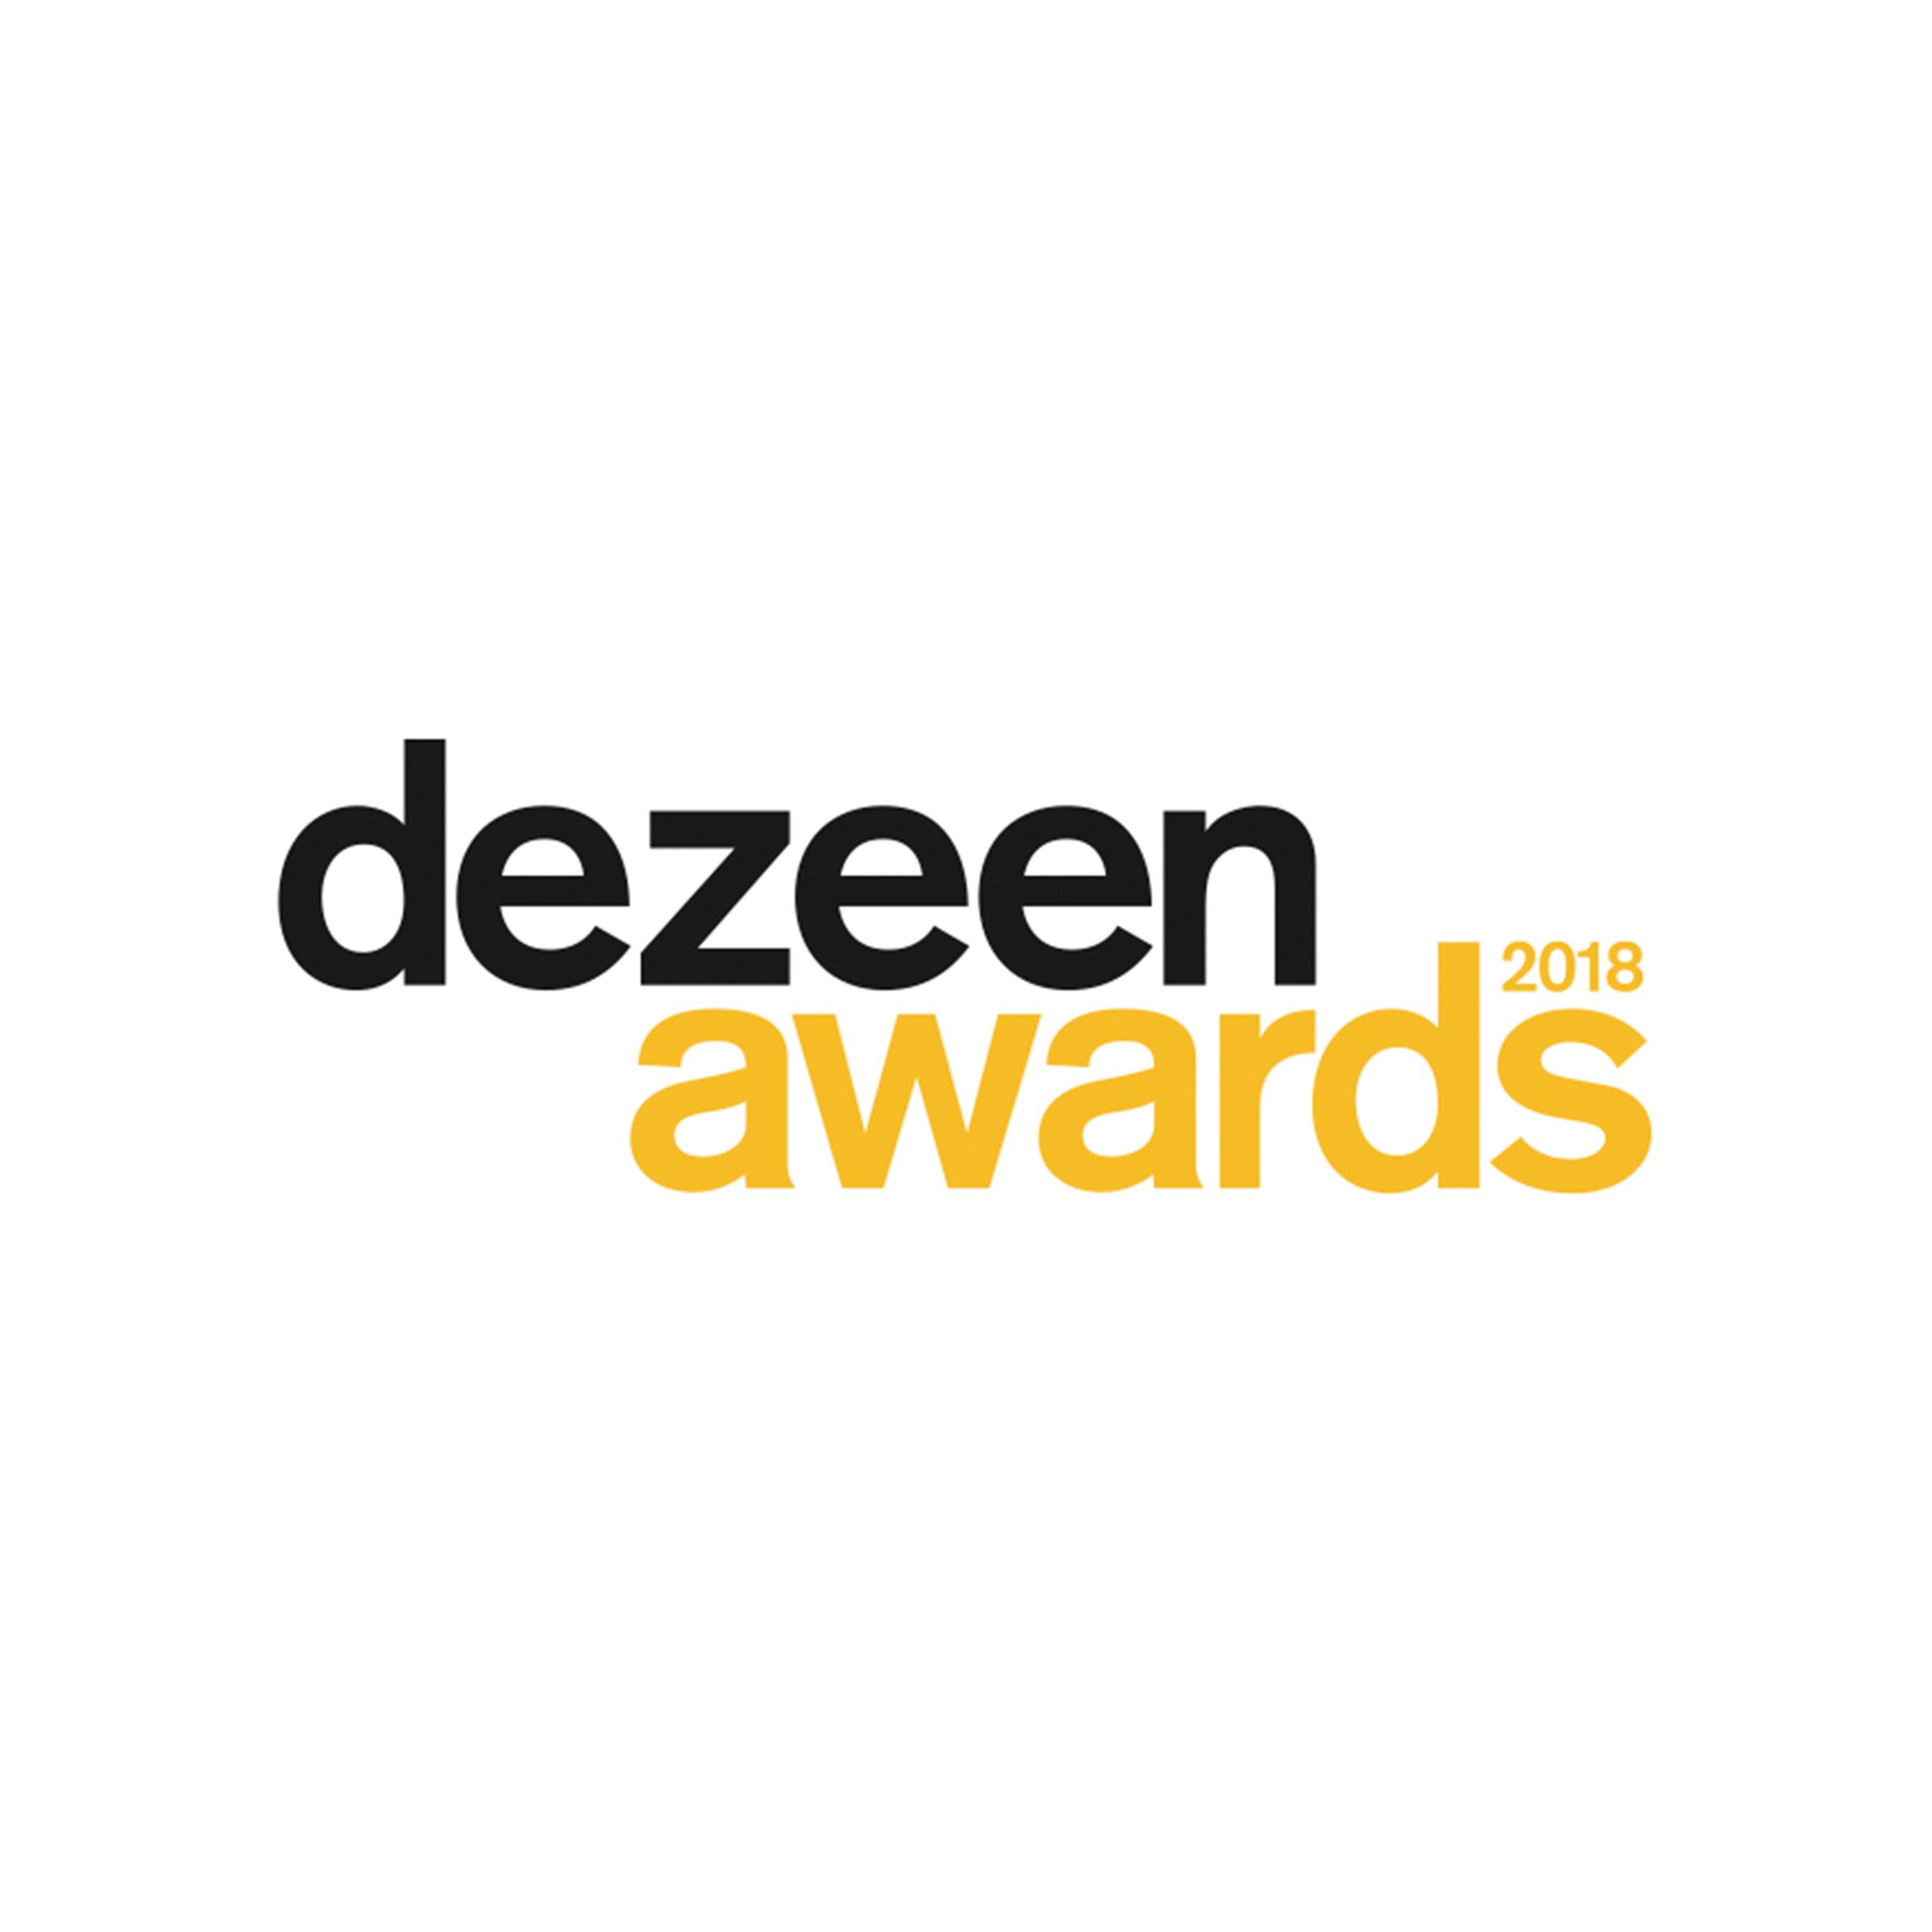 Dezeen Awards 2018 - GreenFrame by Kauppi & Kauppi - Longlisted .jpg